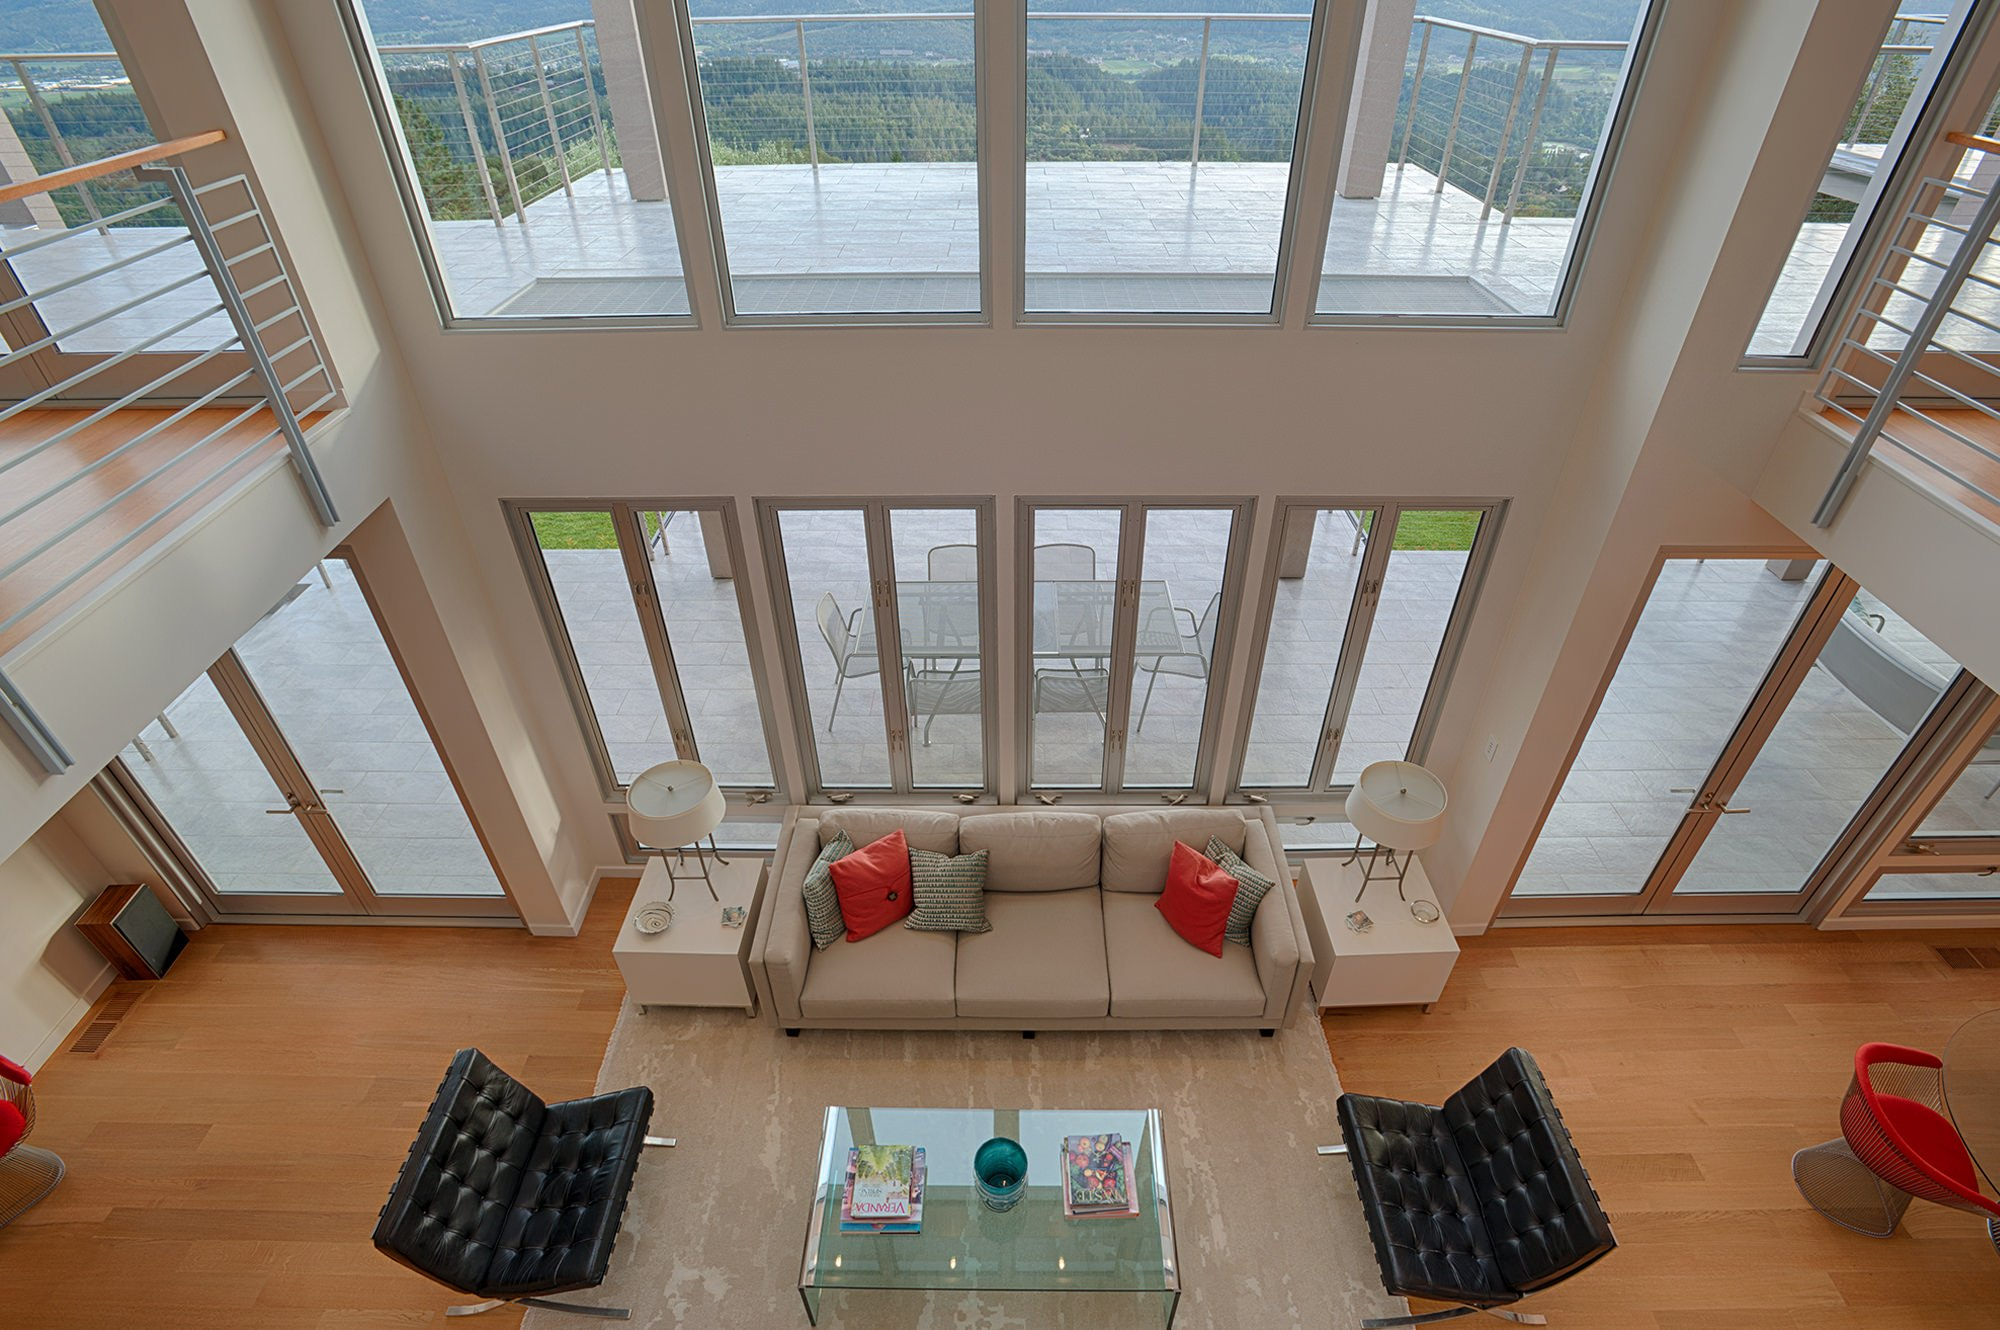 Large windows overlooking Vineyards